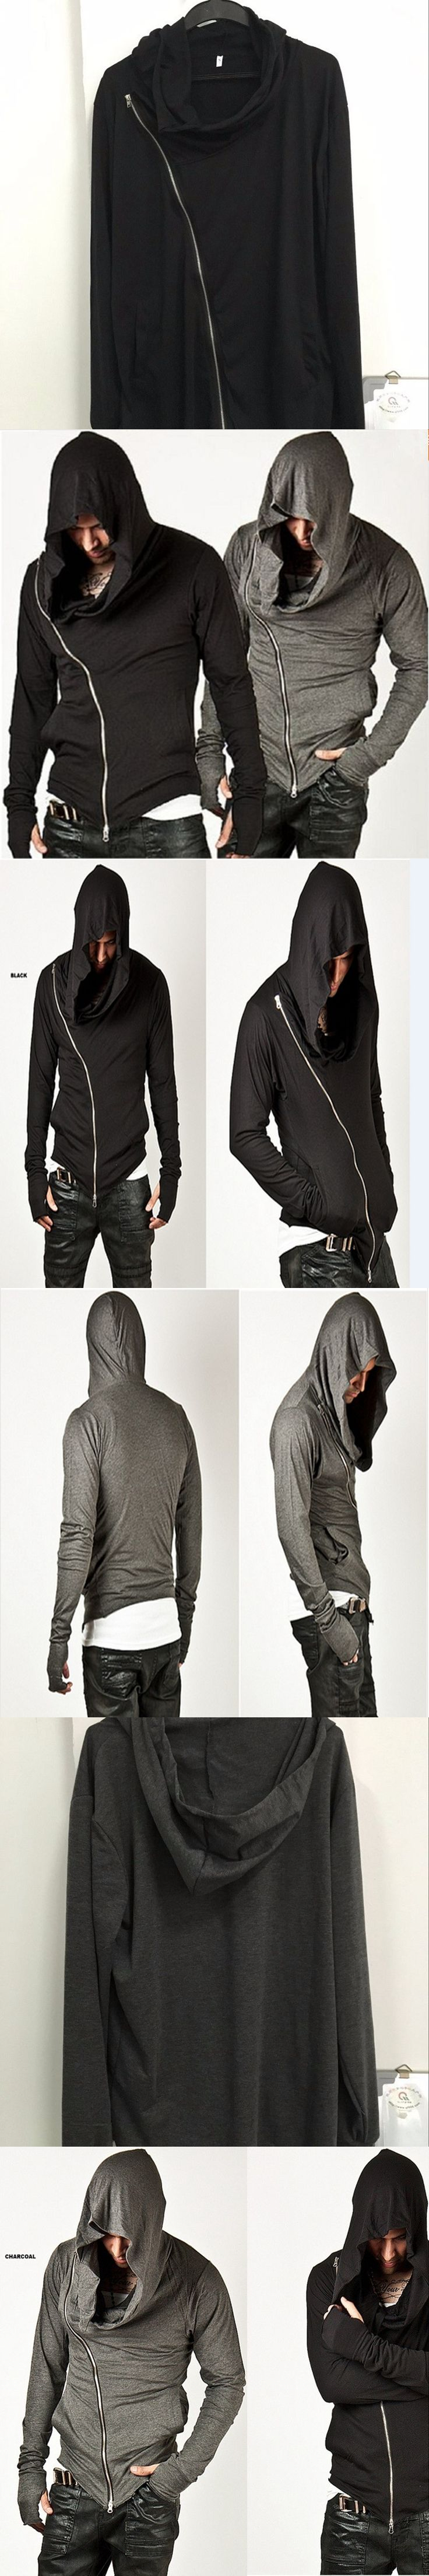 2017 Fashion Coat loose Large Size Men's Sportswear Jacket Unbeatable Arm Warmer Diagonal Zip Mens Assassin Creed Hoodie